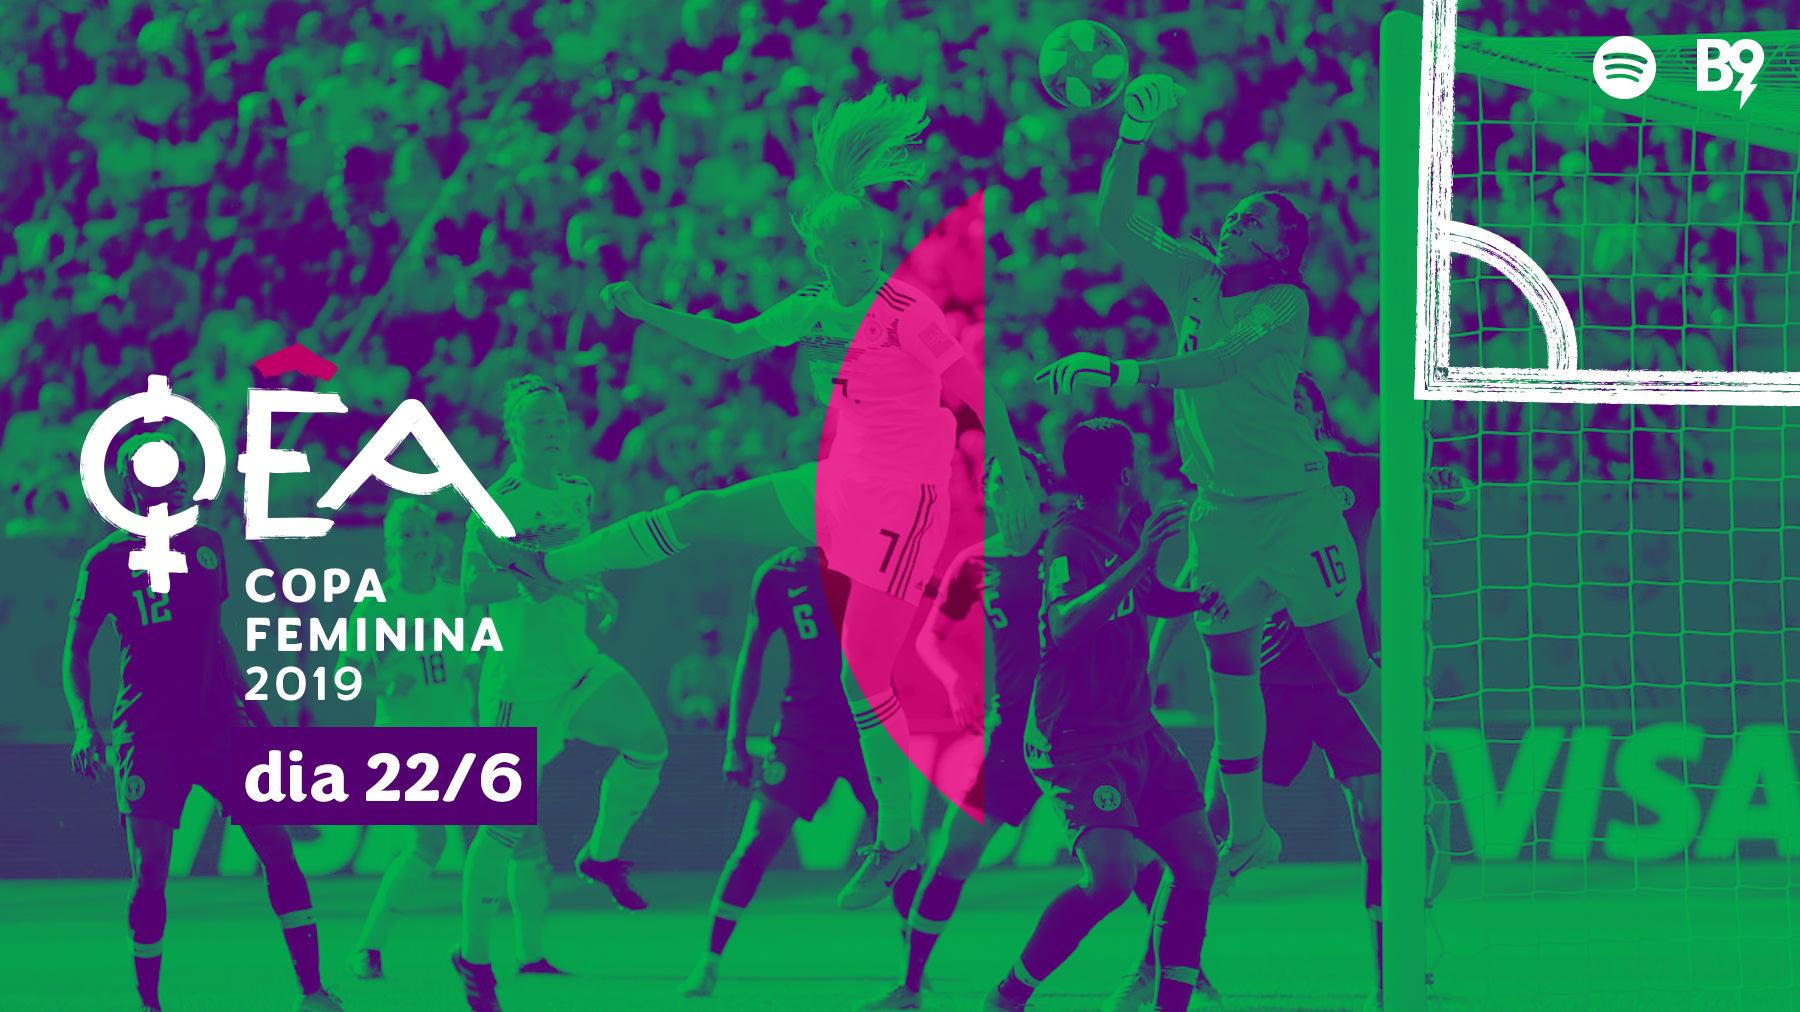 Oêa: Copa 2019 — 🇩🇪 3-0 🇳🇬 / 🇳🇴 1-1 🇦🇺